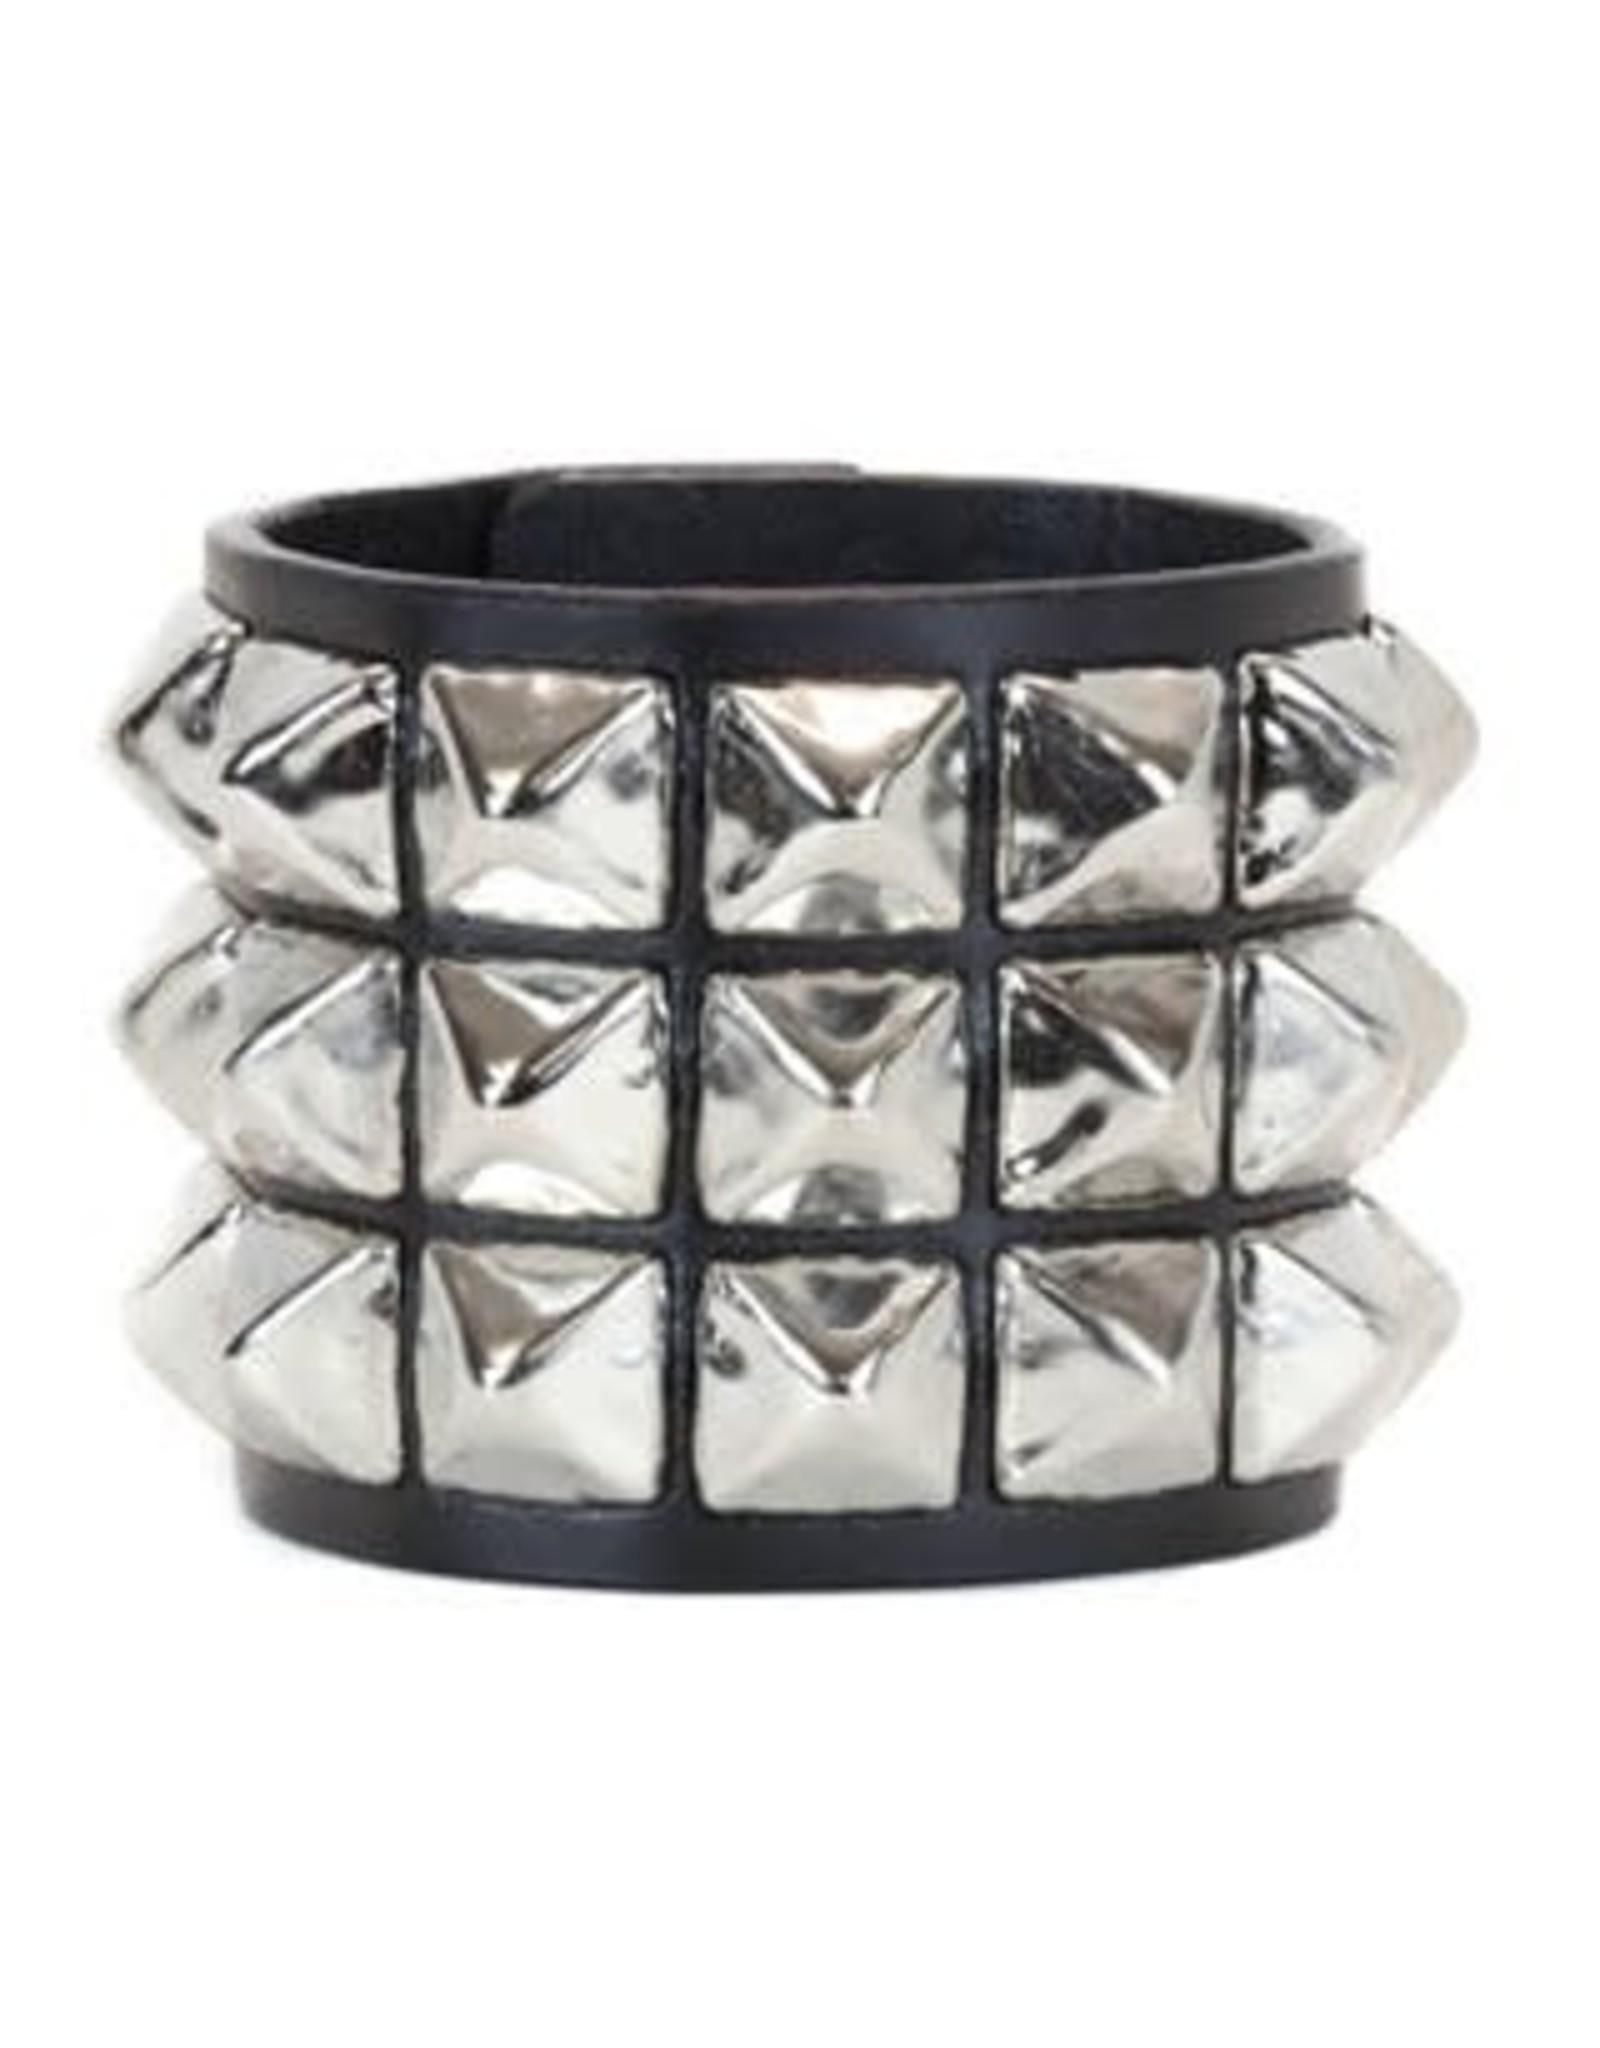 FUNKPLUS - Bracelet 3 Rows Big Silver Studs